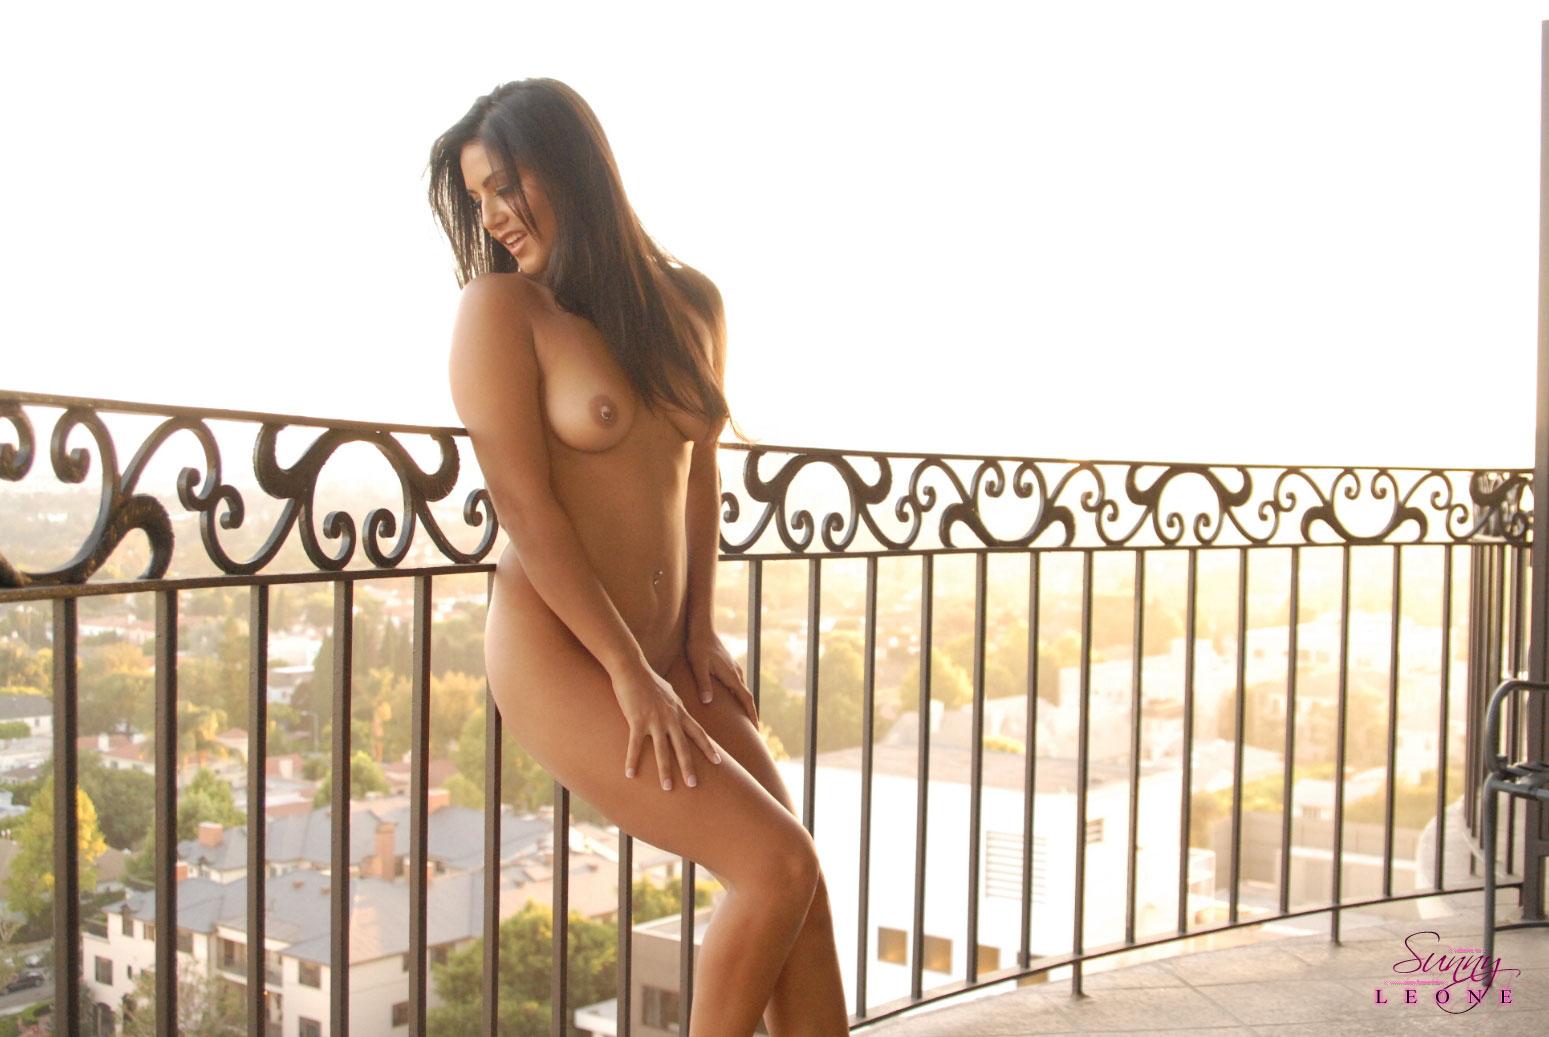 Sunny Leone, brunette, nude, outdoors, piercings